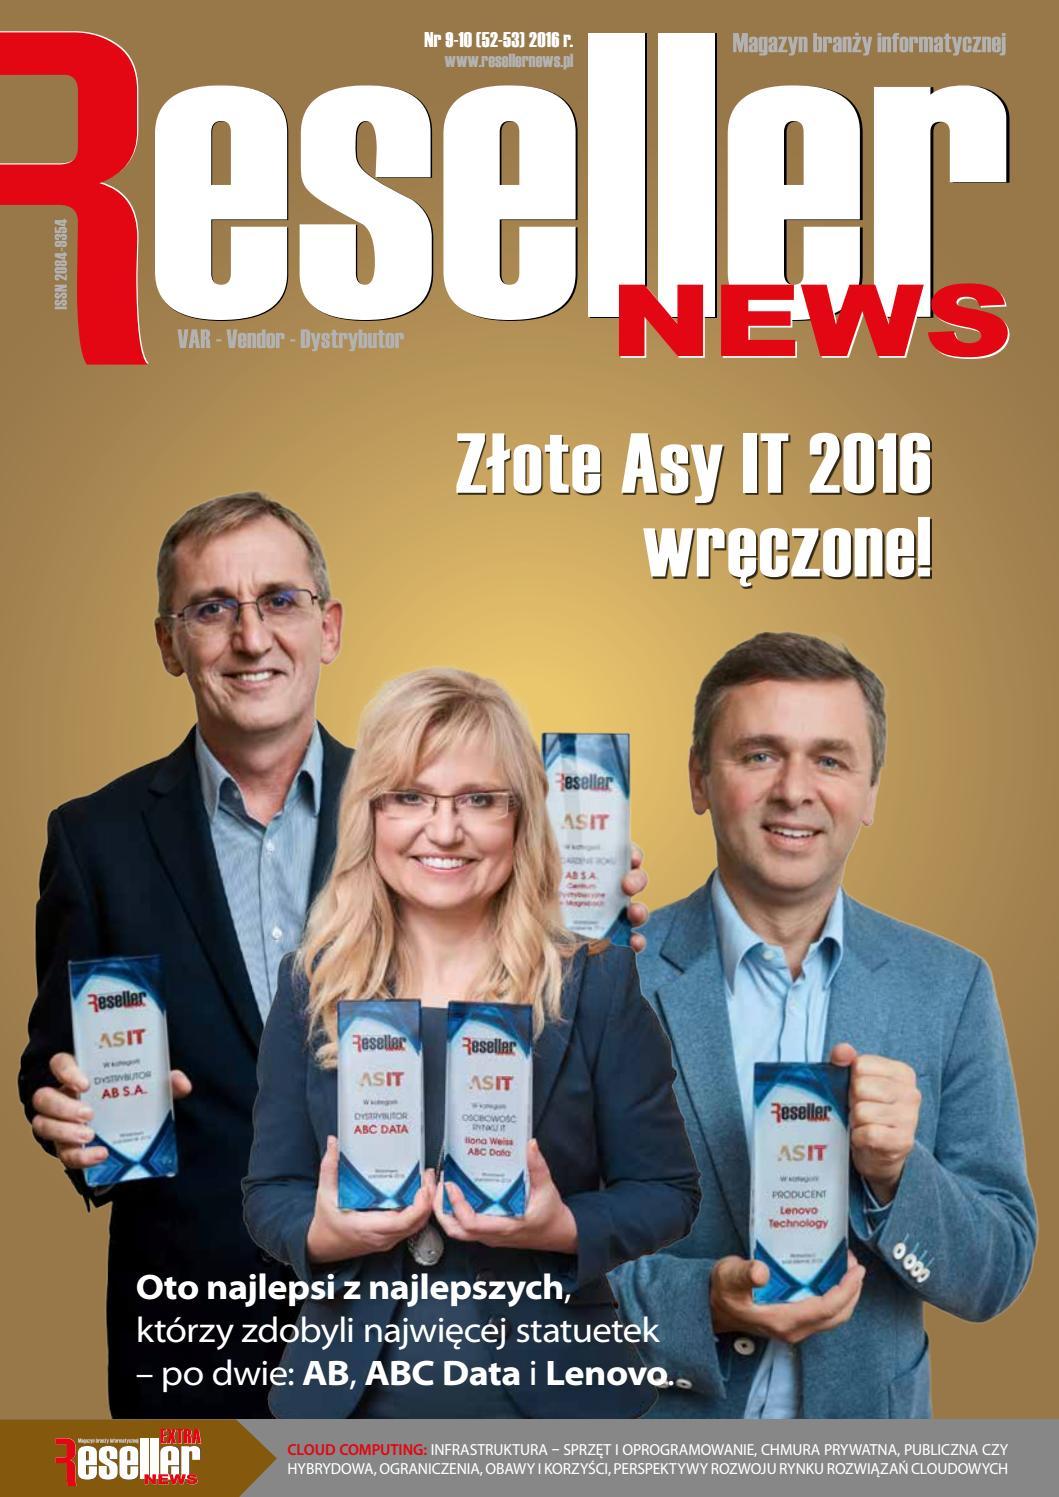 4162e37aef Reseller news 9 10 (52 53) 2016 by Dariusz Walach - issuu